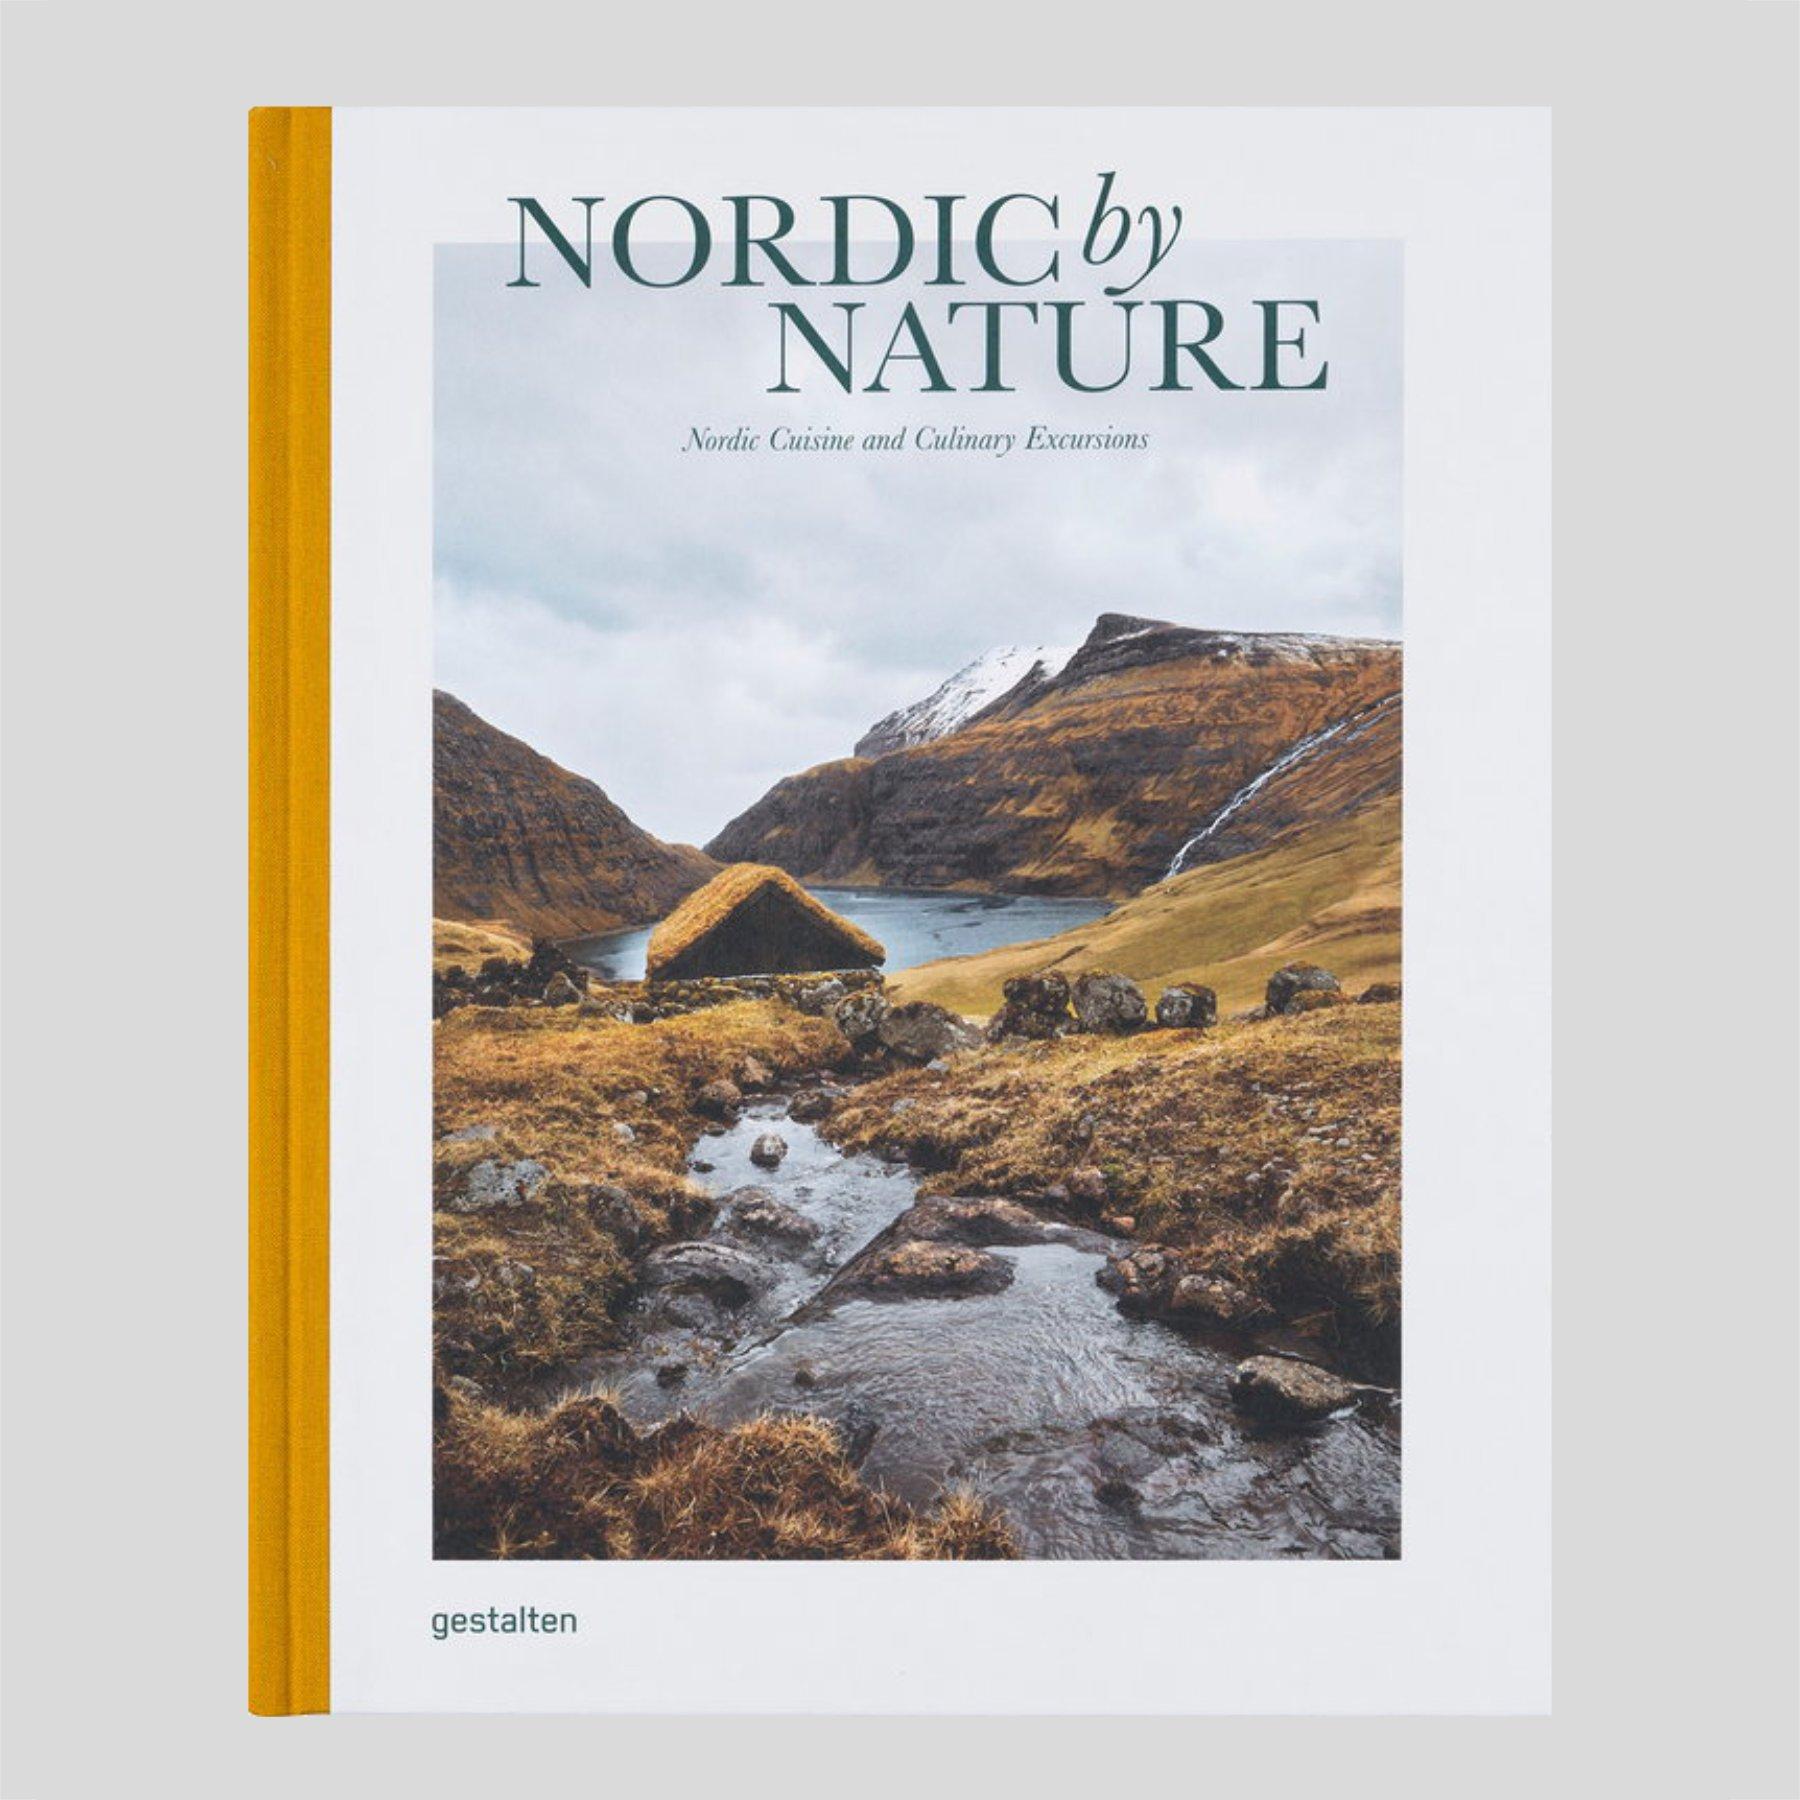 scandinavian feeling best nordic by nature cookbooks